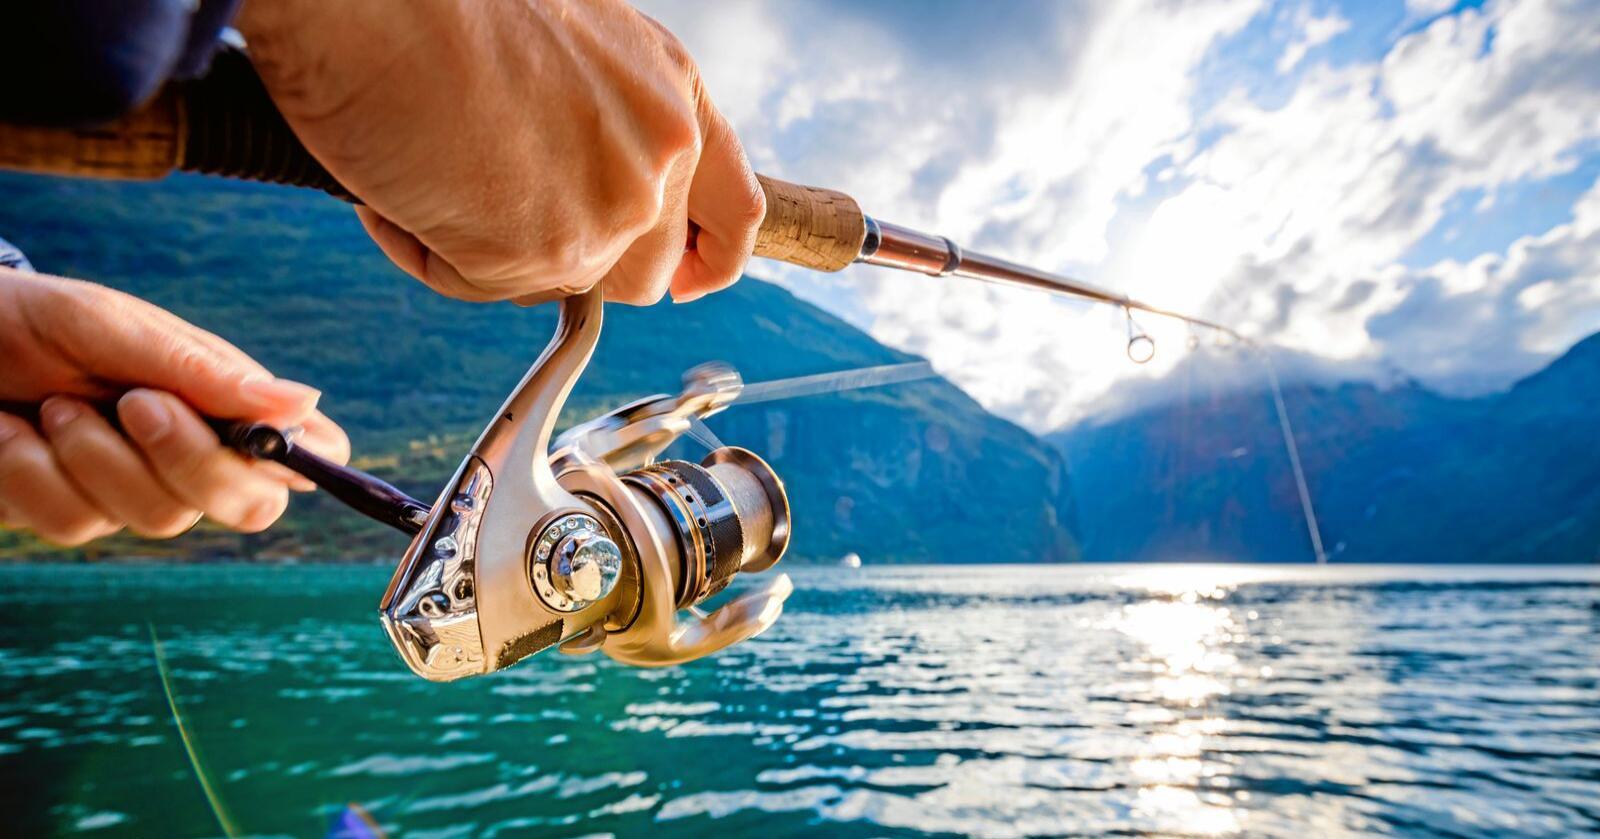 Fiske: Nærings- og fiskeridepartementet har sendt ut forslag til nytt regelverk for turistfiske i Norge. Foto: Andrey Armyagov / Mostphotos